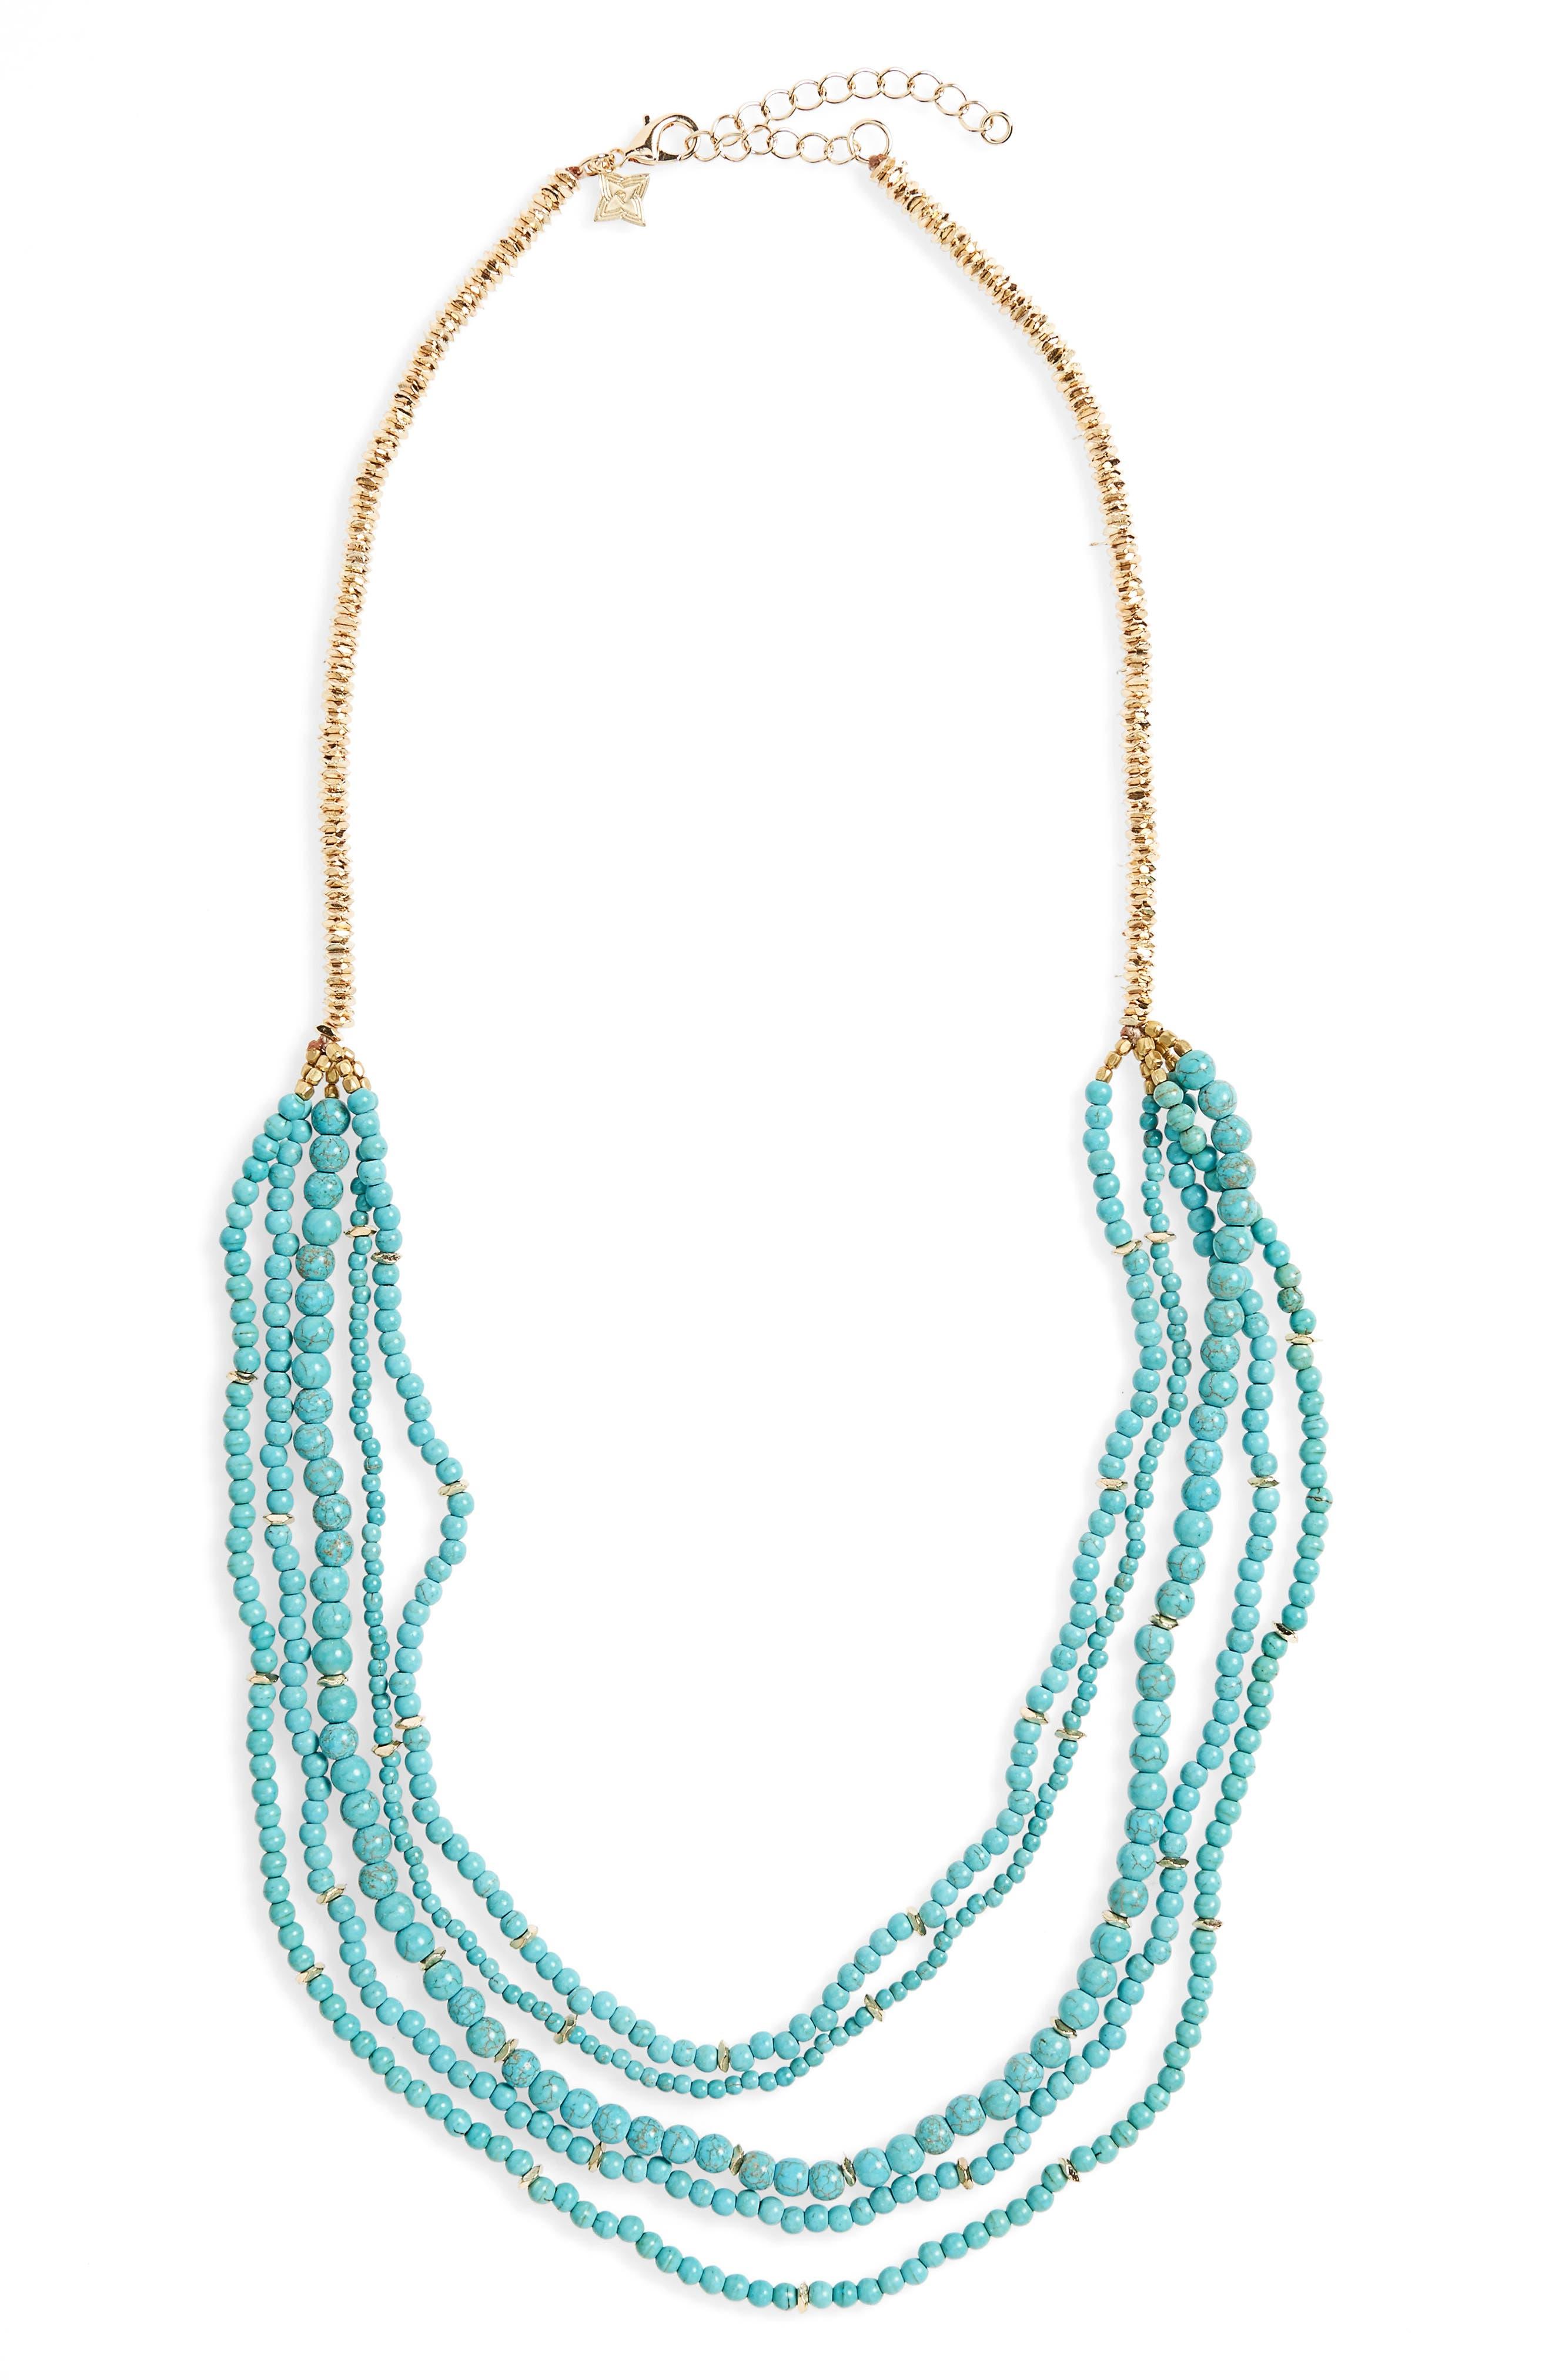 Alternate Image 1 Selected - Panacea Howlite & Quartz Multistrand Necklace